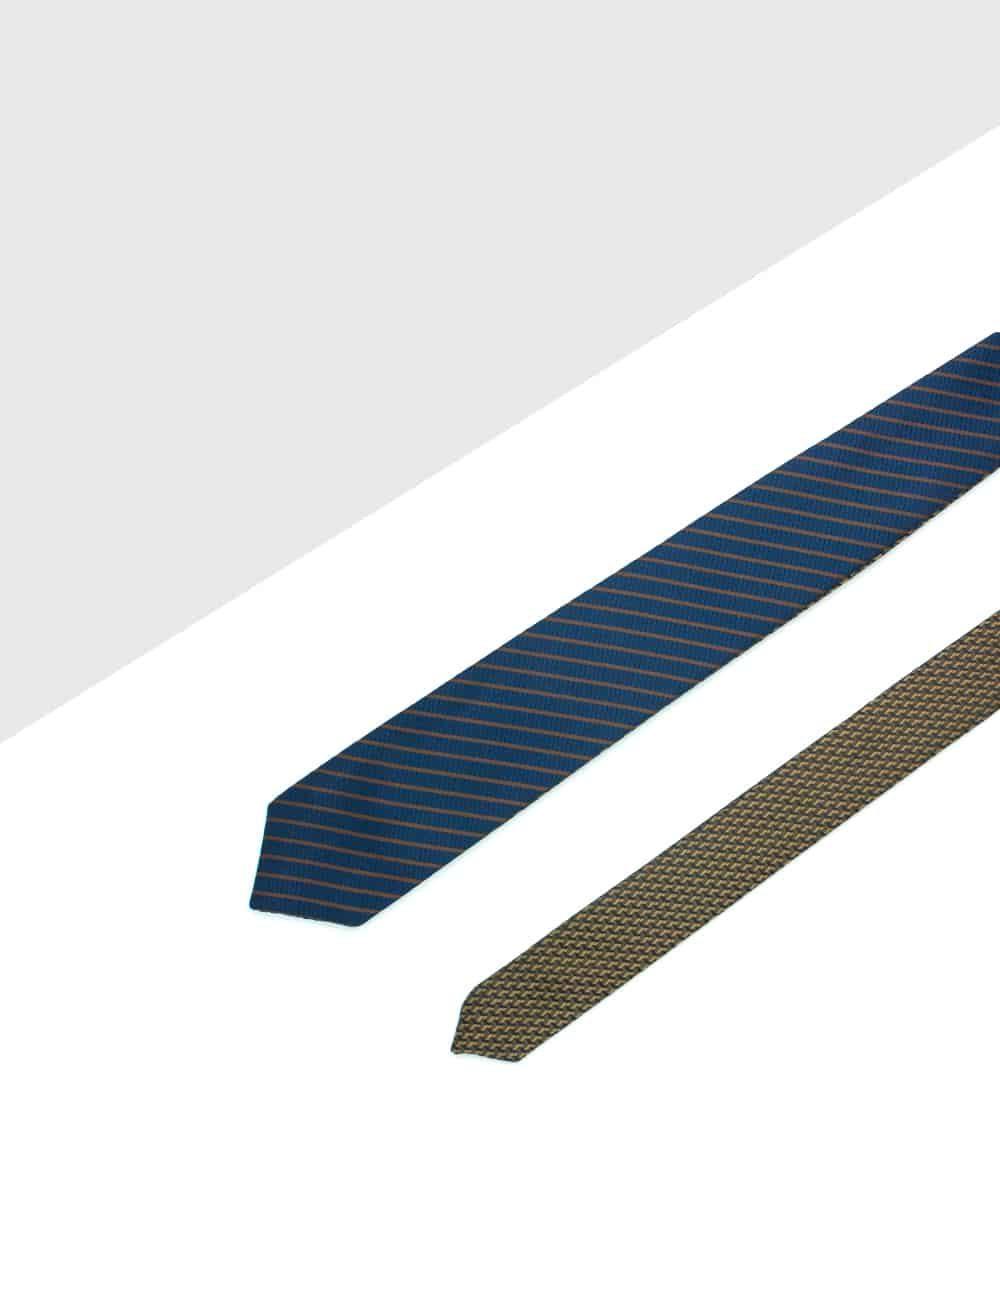 Brown Bricks and Navy Stripes Reversible Woven Necktie RNT23.8